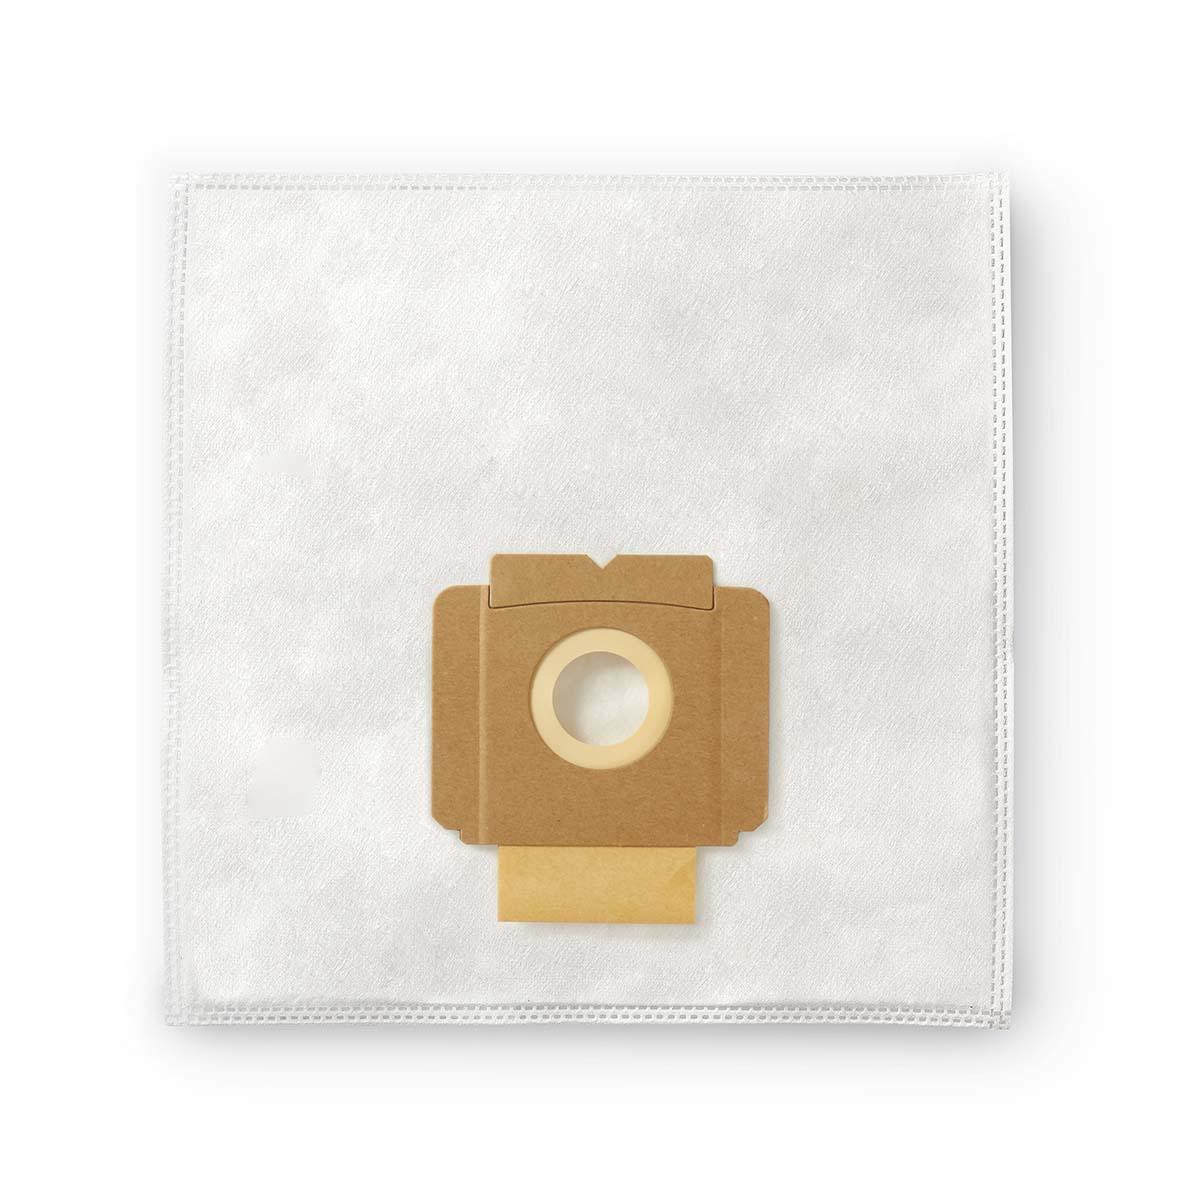 10 Staubsaugerbeutel Progress Diamant M 300-399 Filtertüten